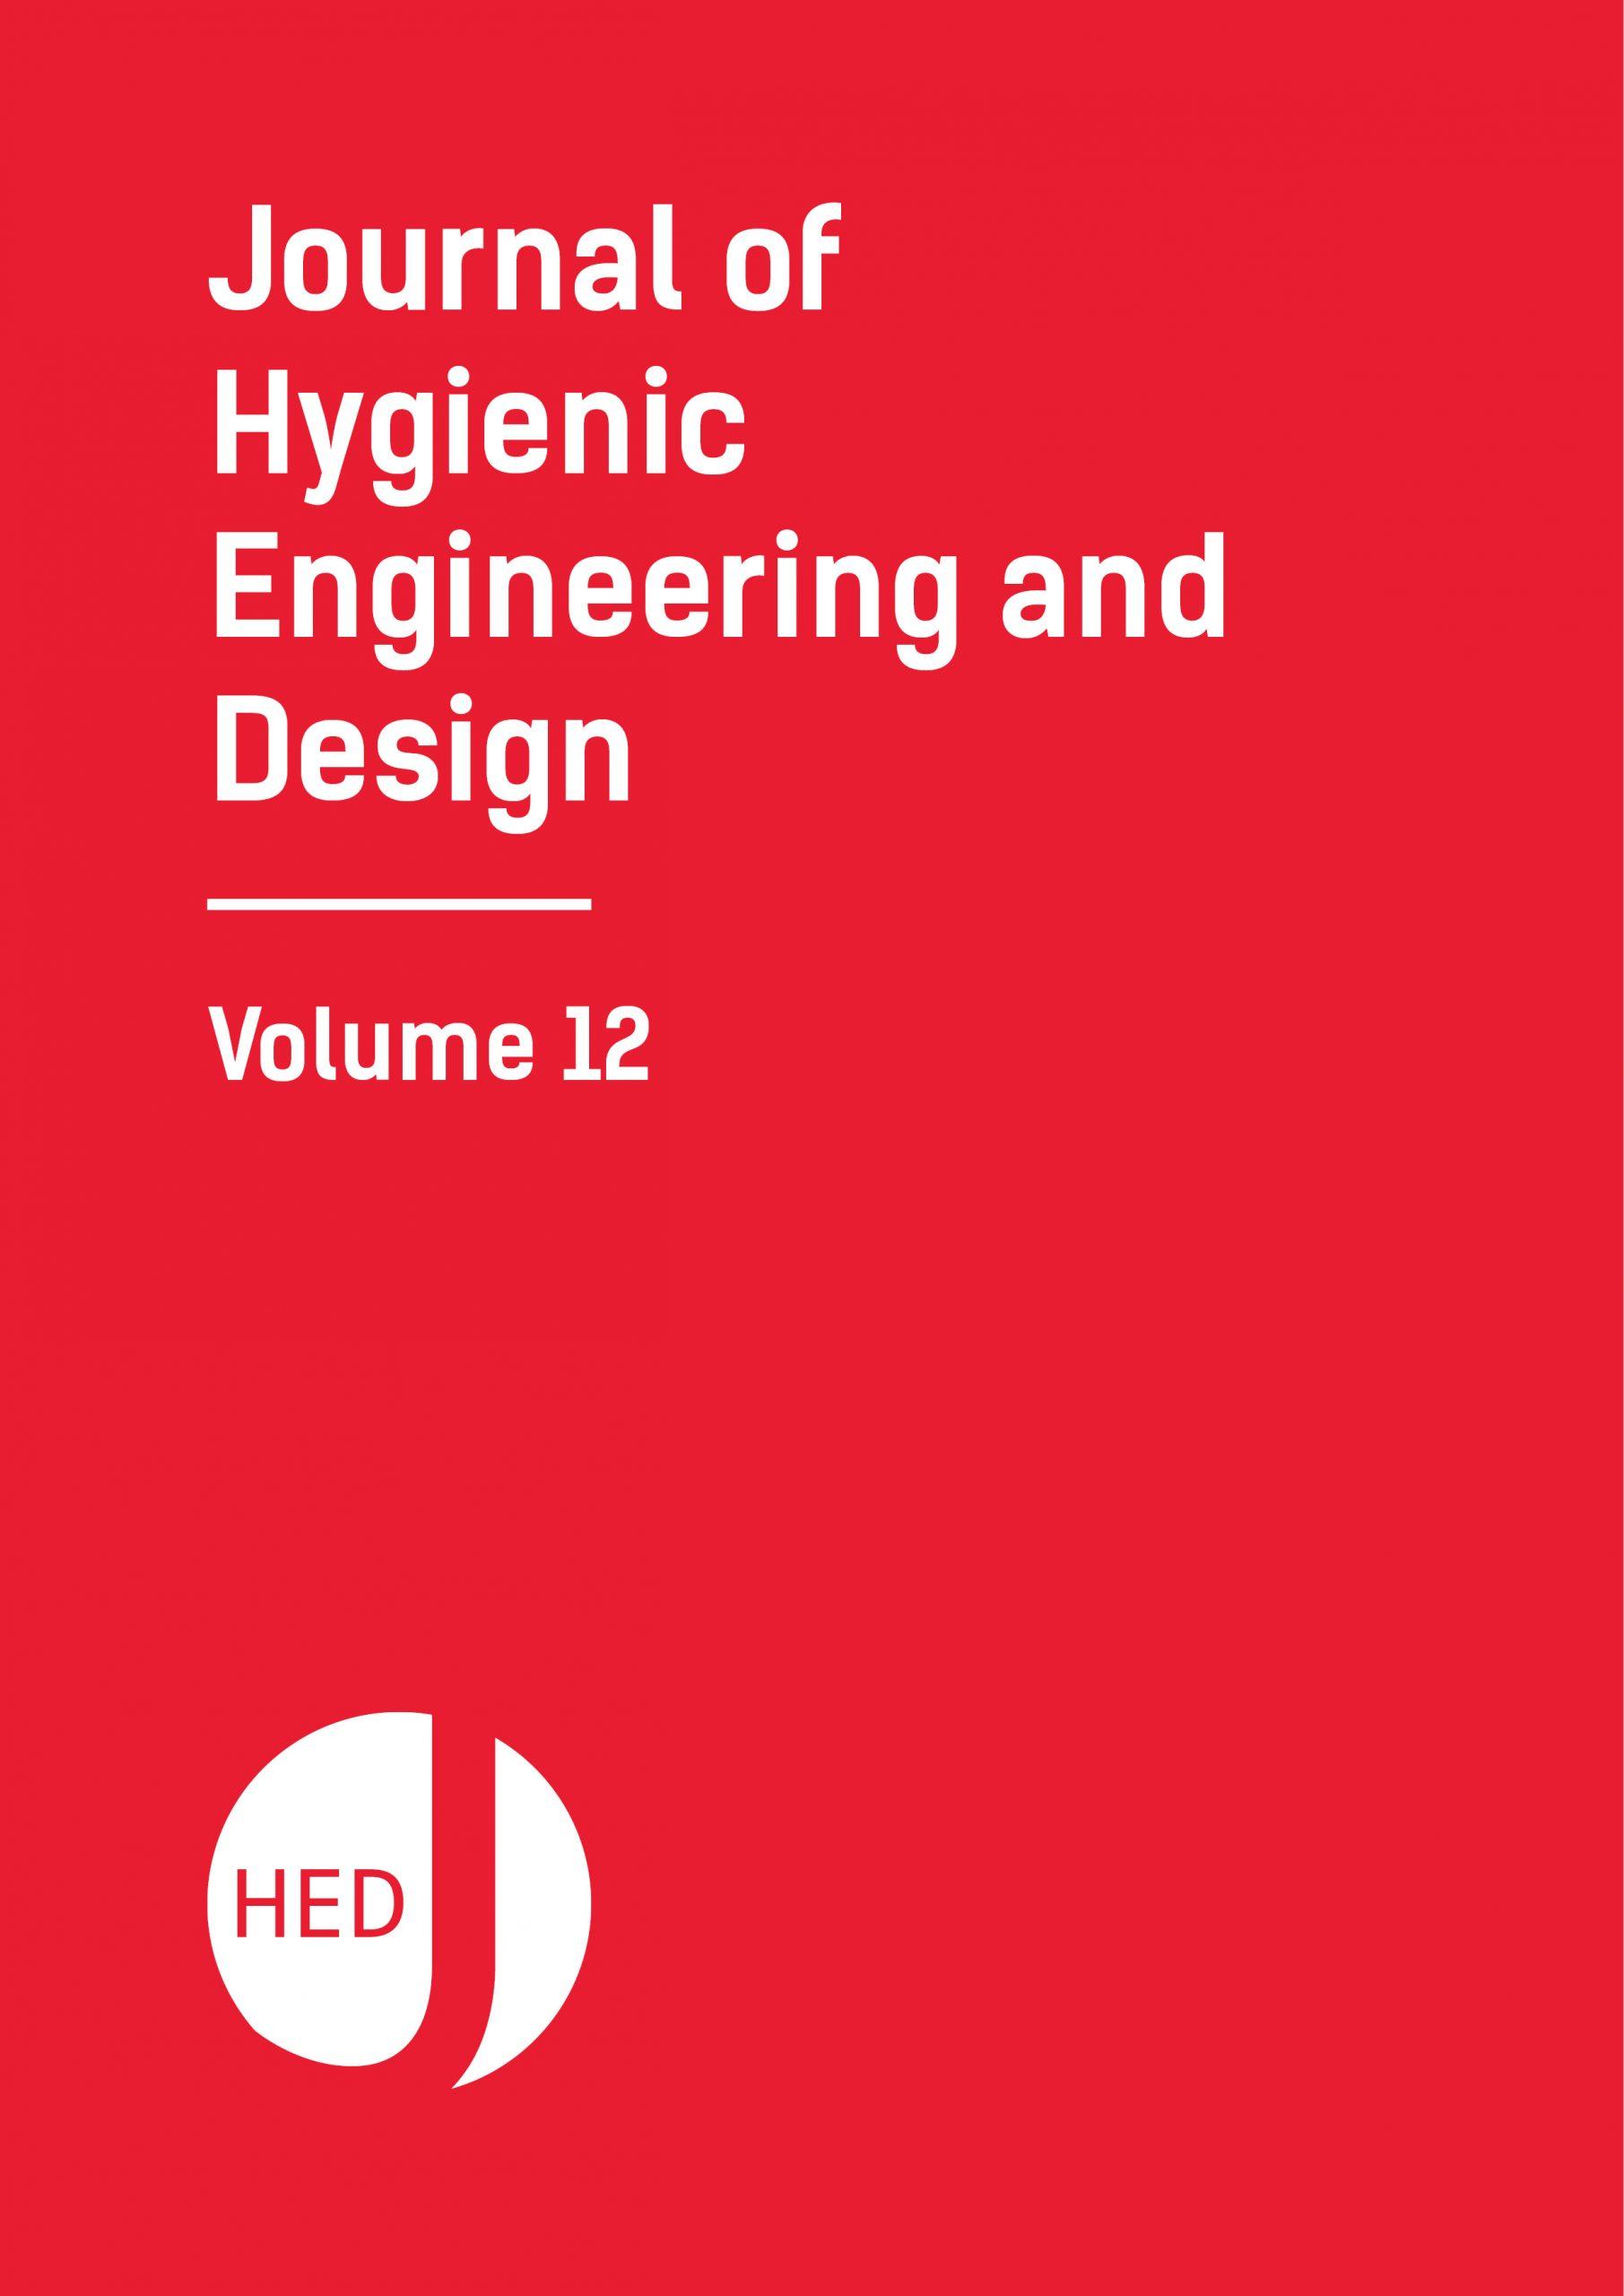 JHED Volume 12